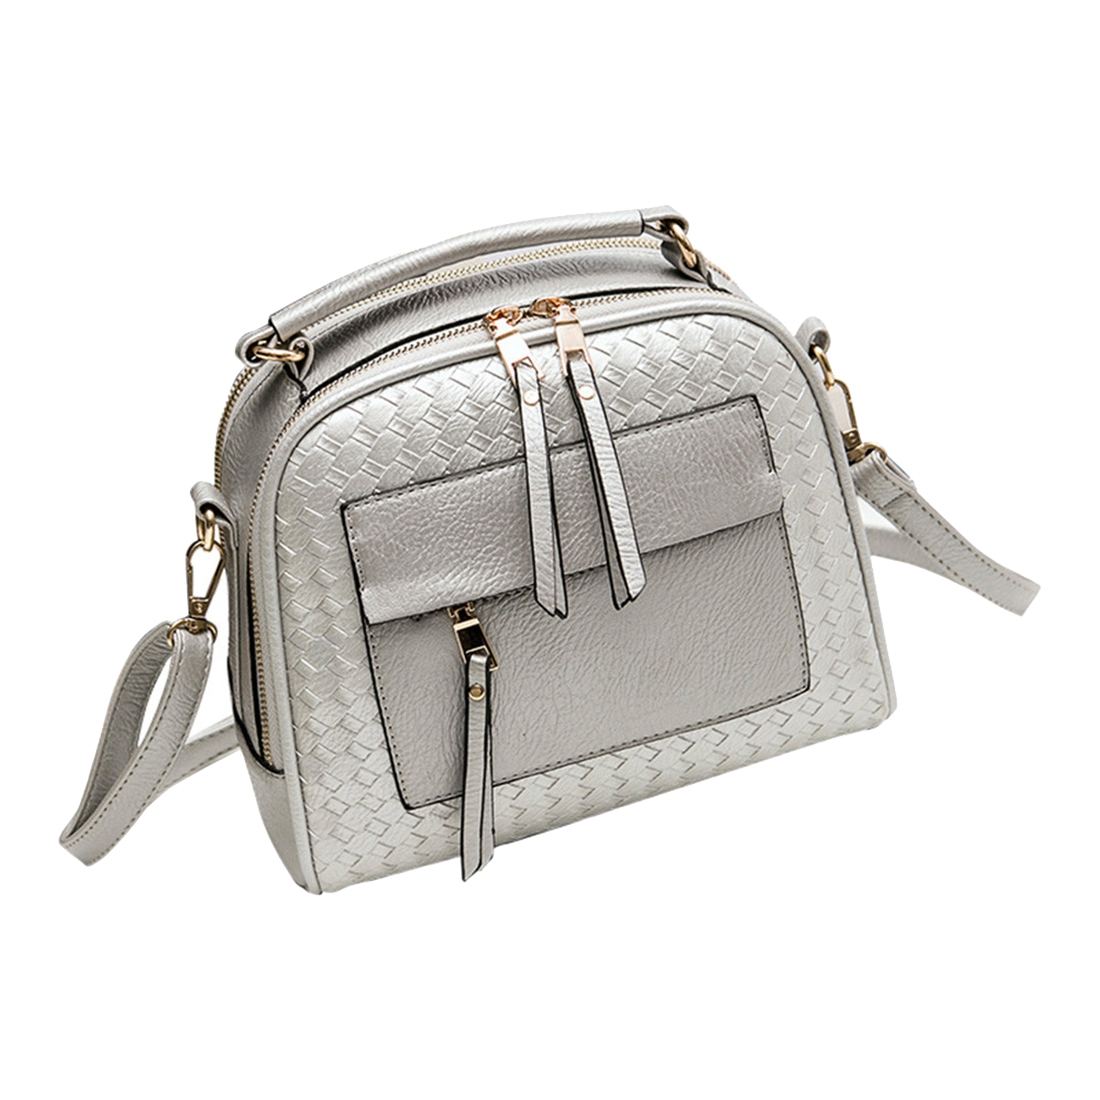 купить 5 pcs of Knitting Women Handbag Fashion Weave Shoulder Bag Small Casual Cross Body Bag Retro Tote недорого